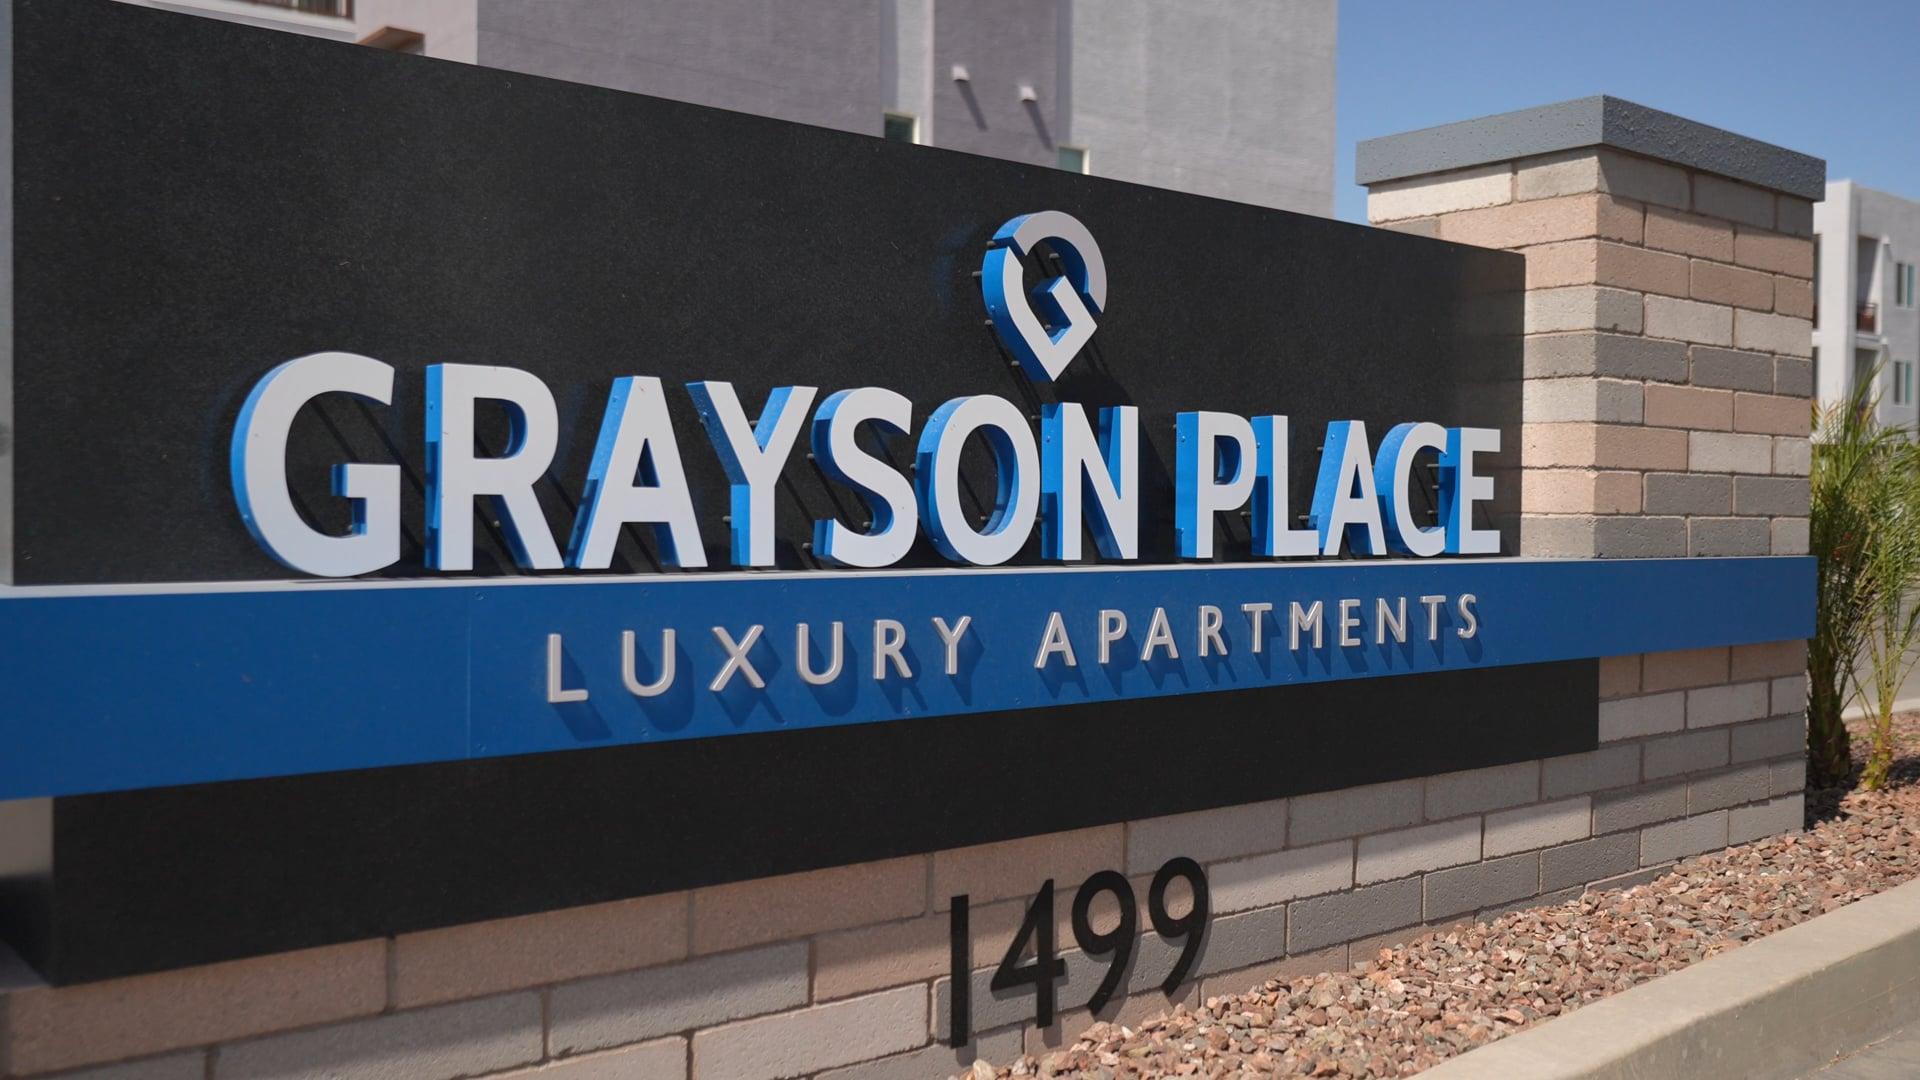 Grayson Place